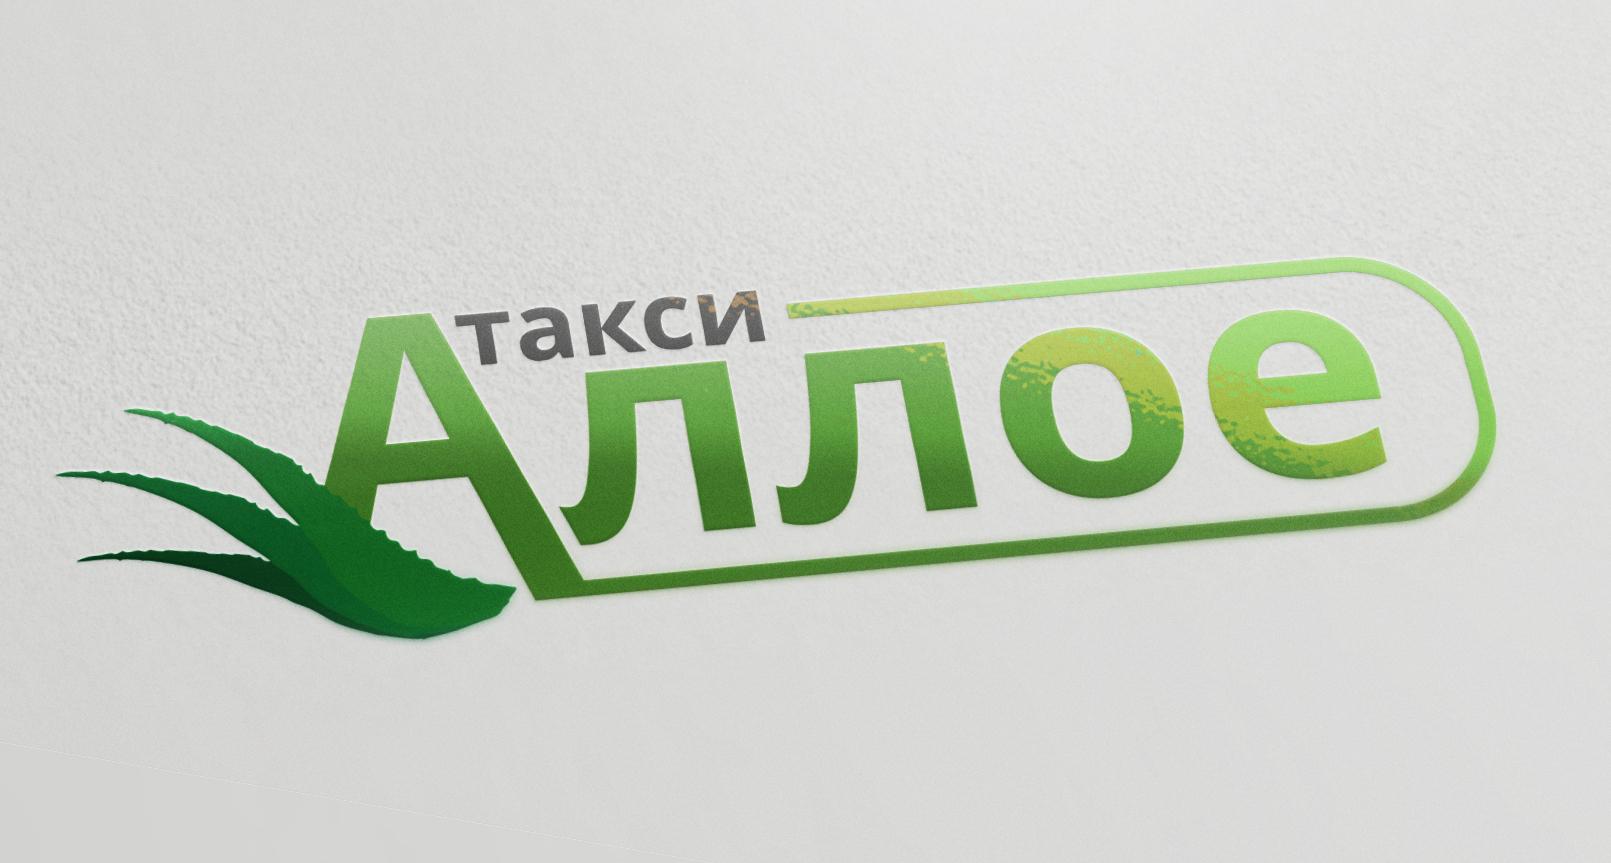 придумать логотип для такси фото f_922539add7a0b71b.jpg